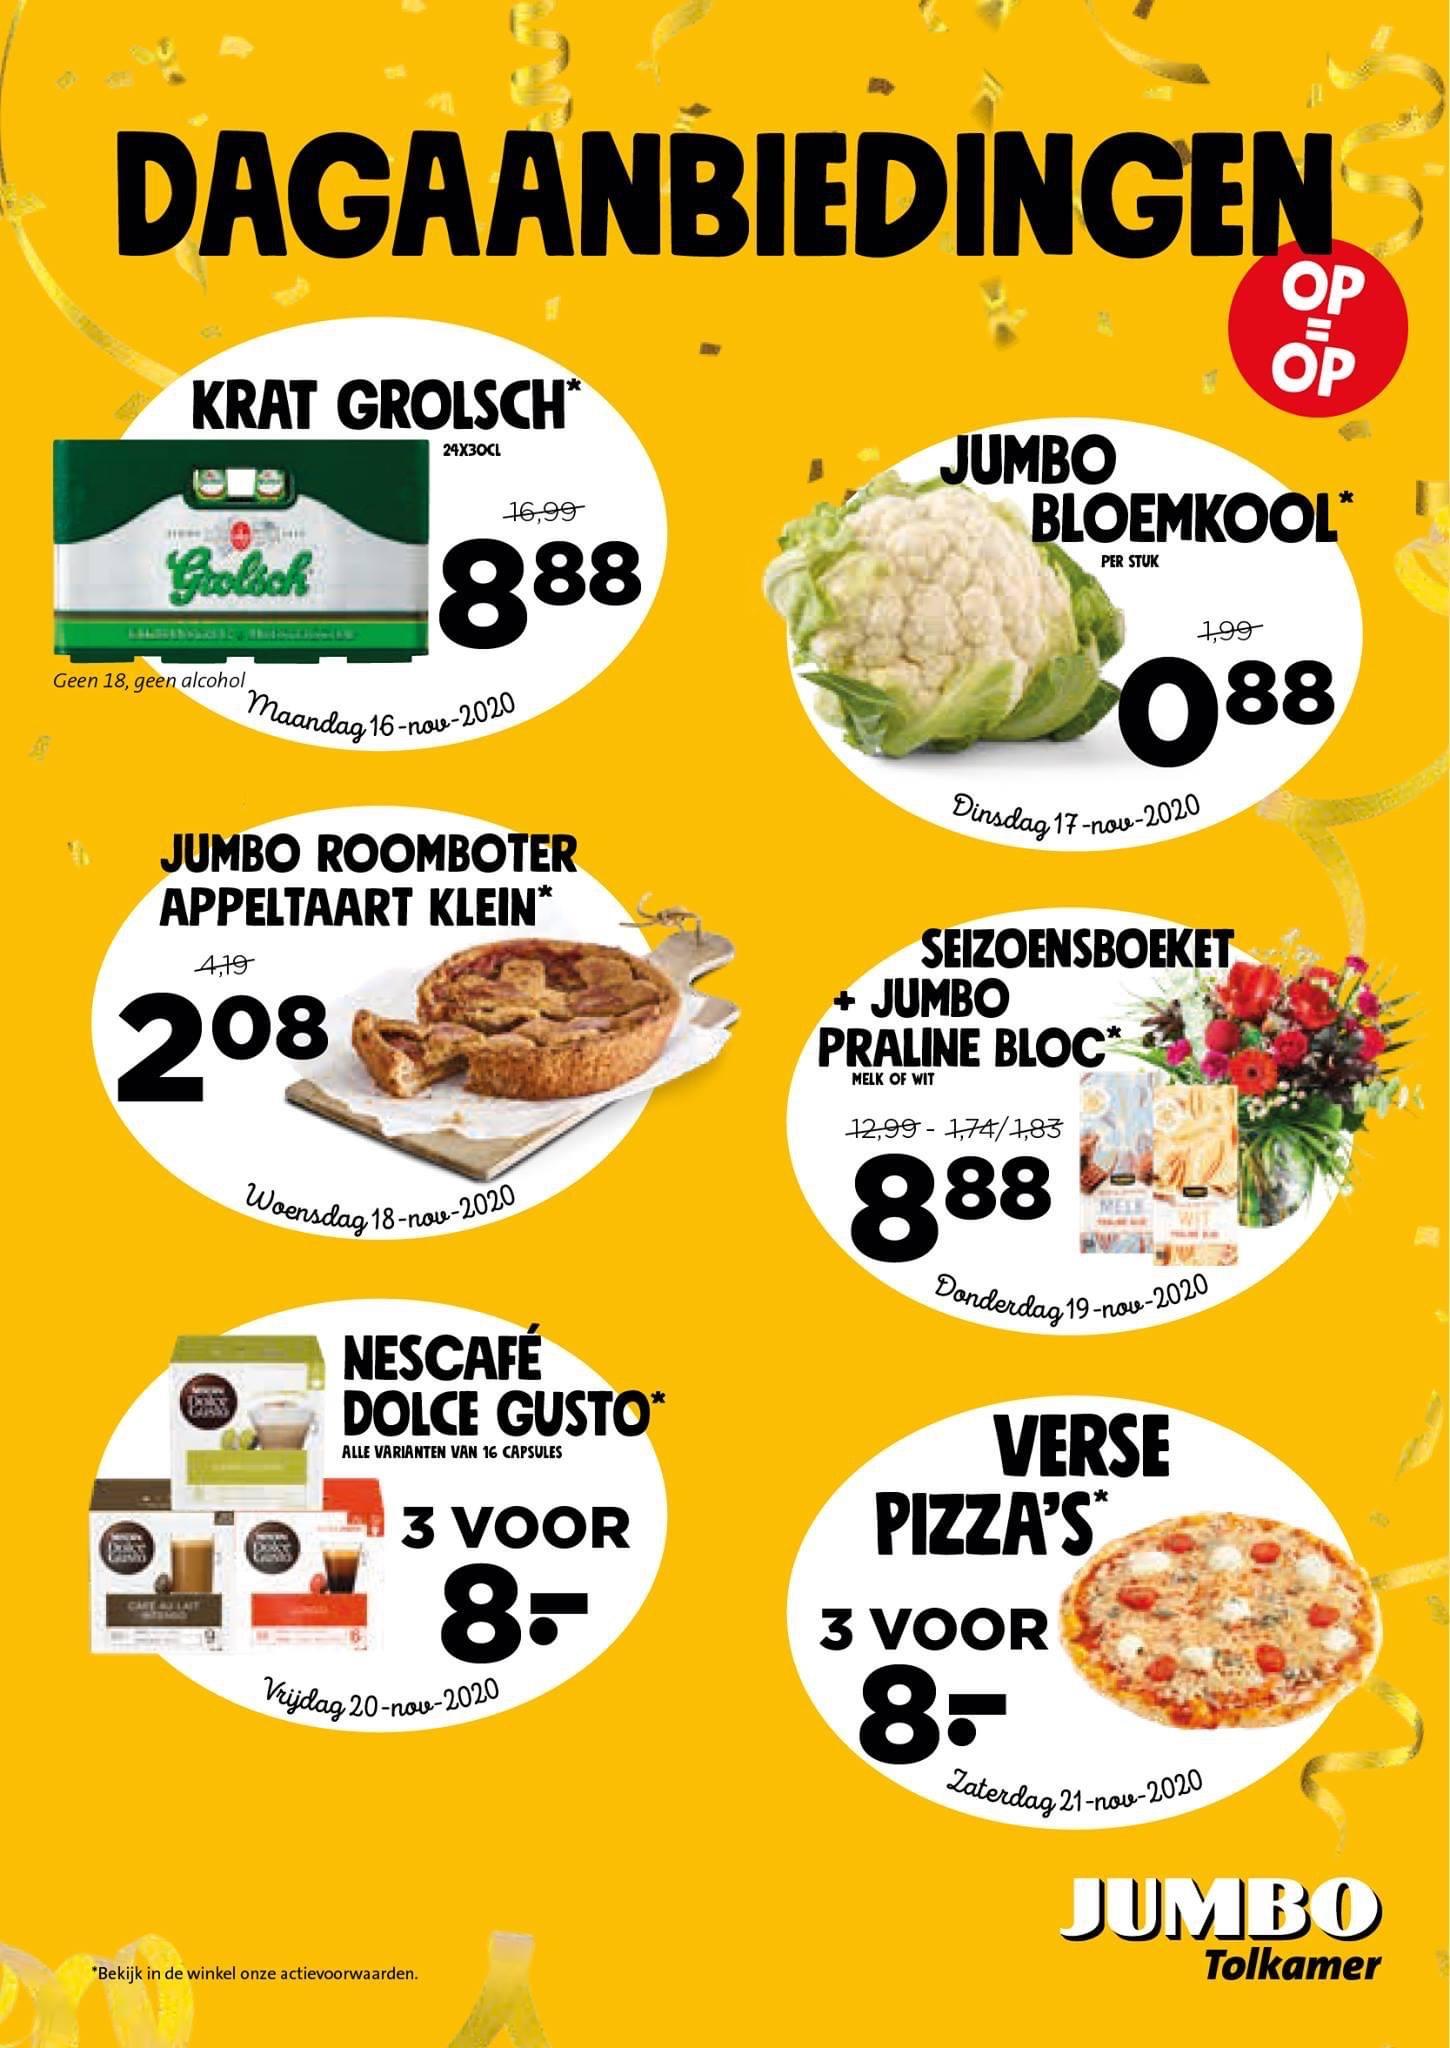 LOKAAL Dolce Gusto 3 voor 8 Euro